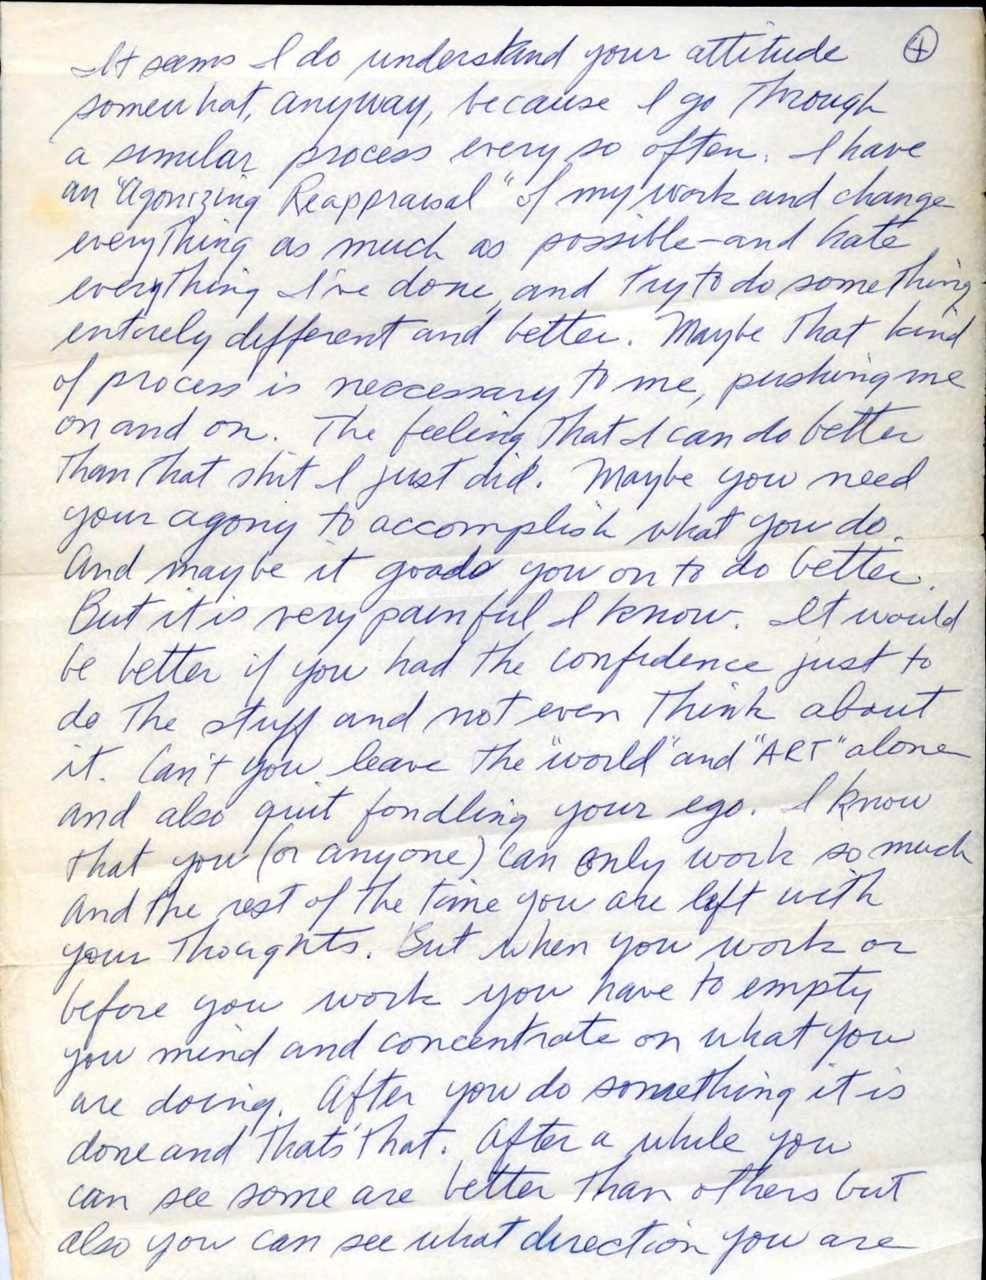 Sol LeWitt-Eva Hesse Letter-Page 4-FINAL